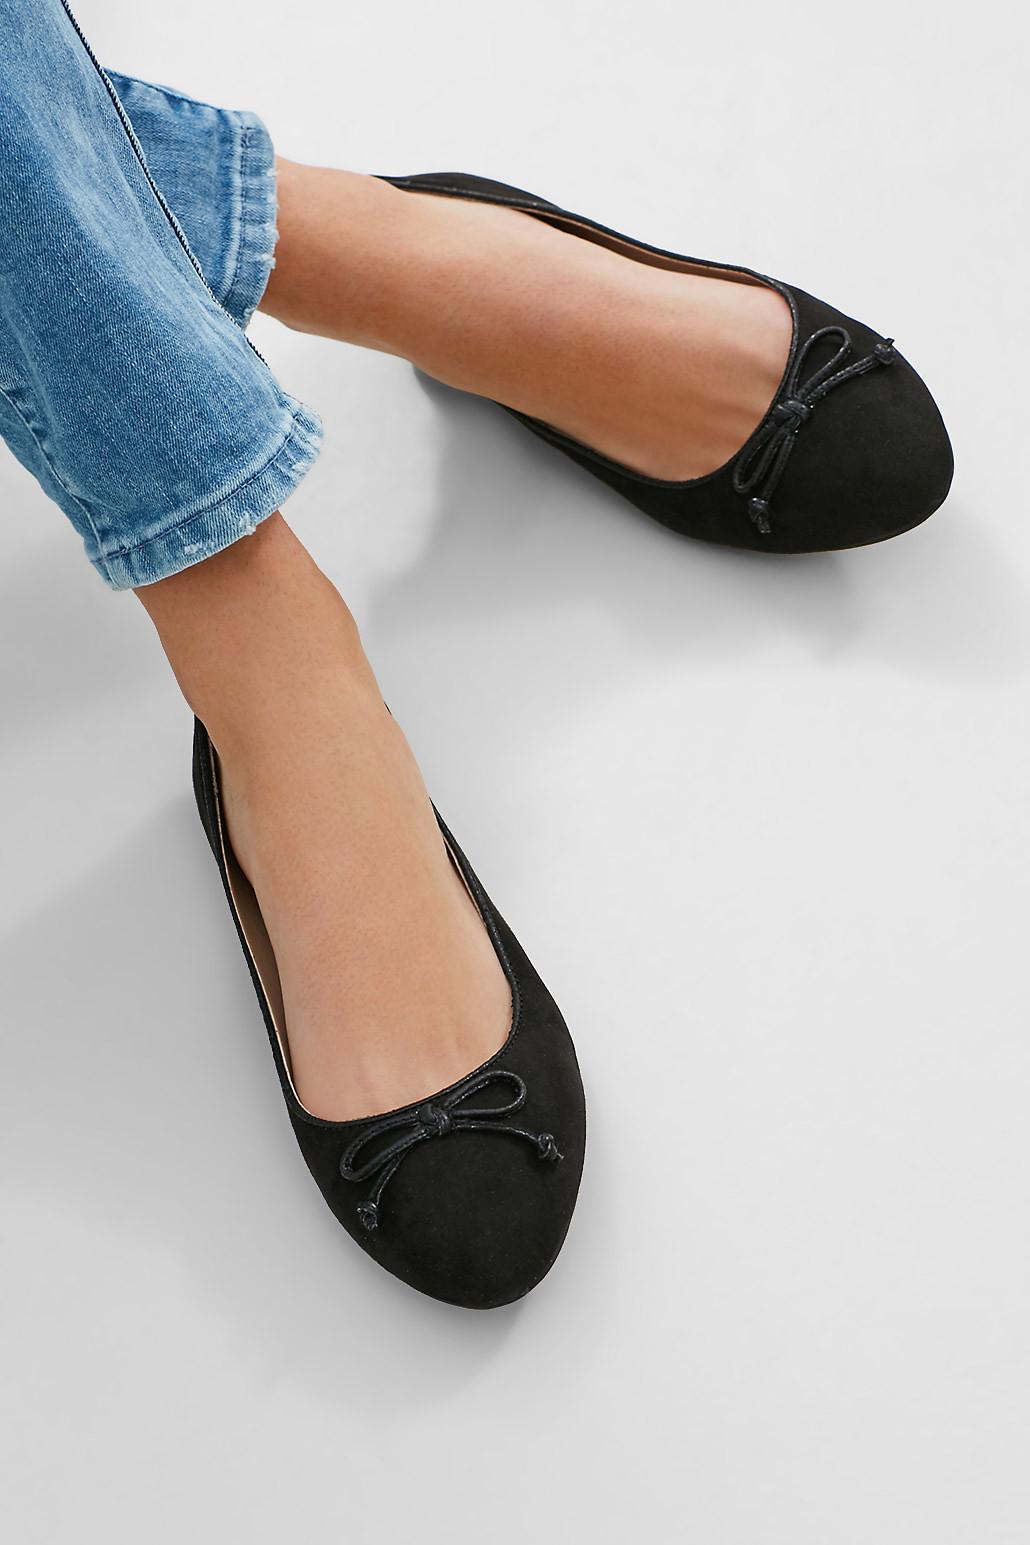 Schuhe ganz ohne Leder